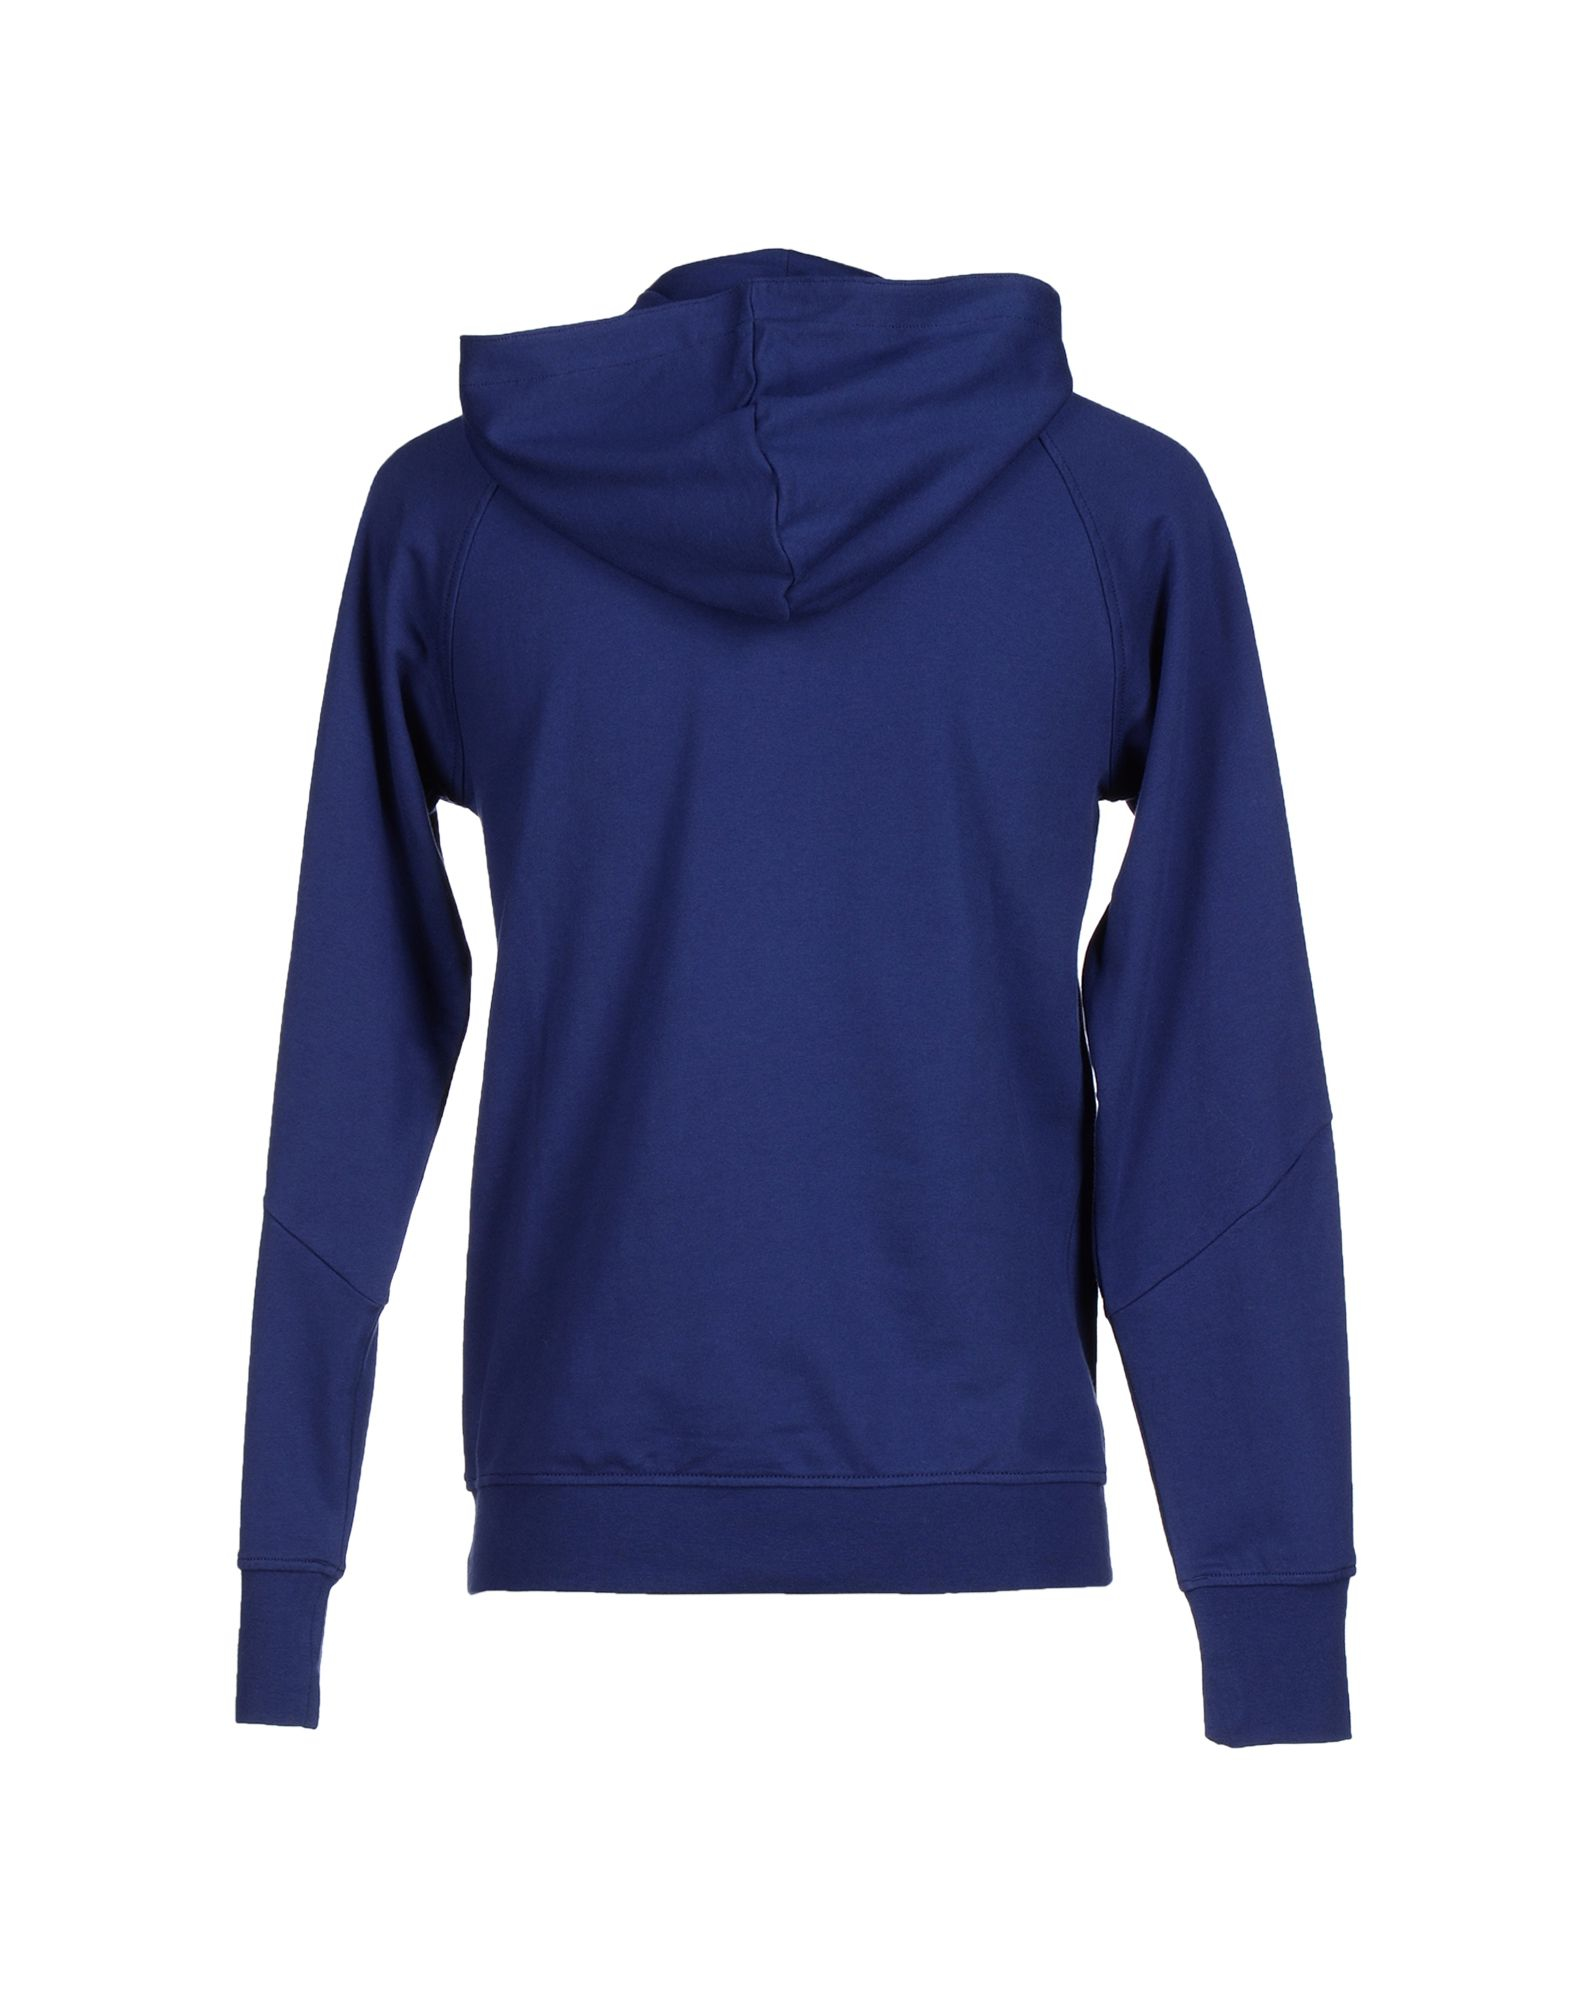 adidas originals sweatshirt in blue for men dark blue lyst. Black Bedroom Furniture Sets. Home Design Ideas